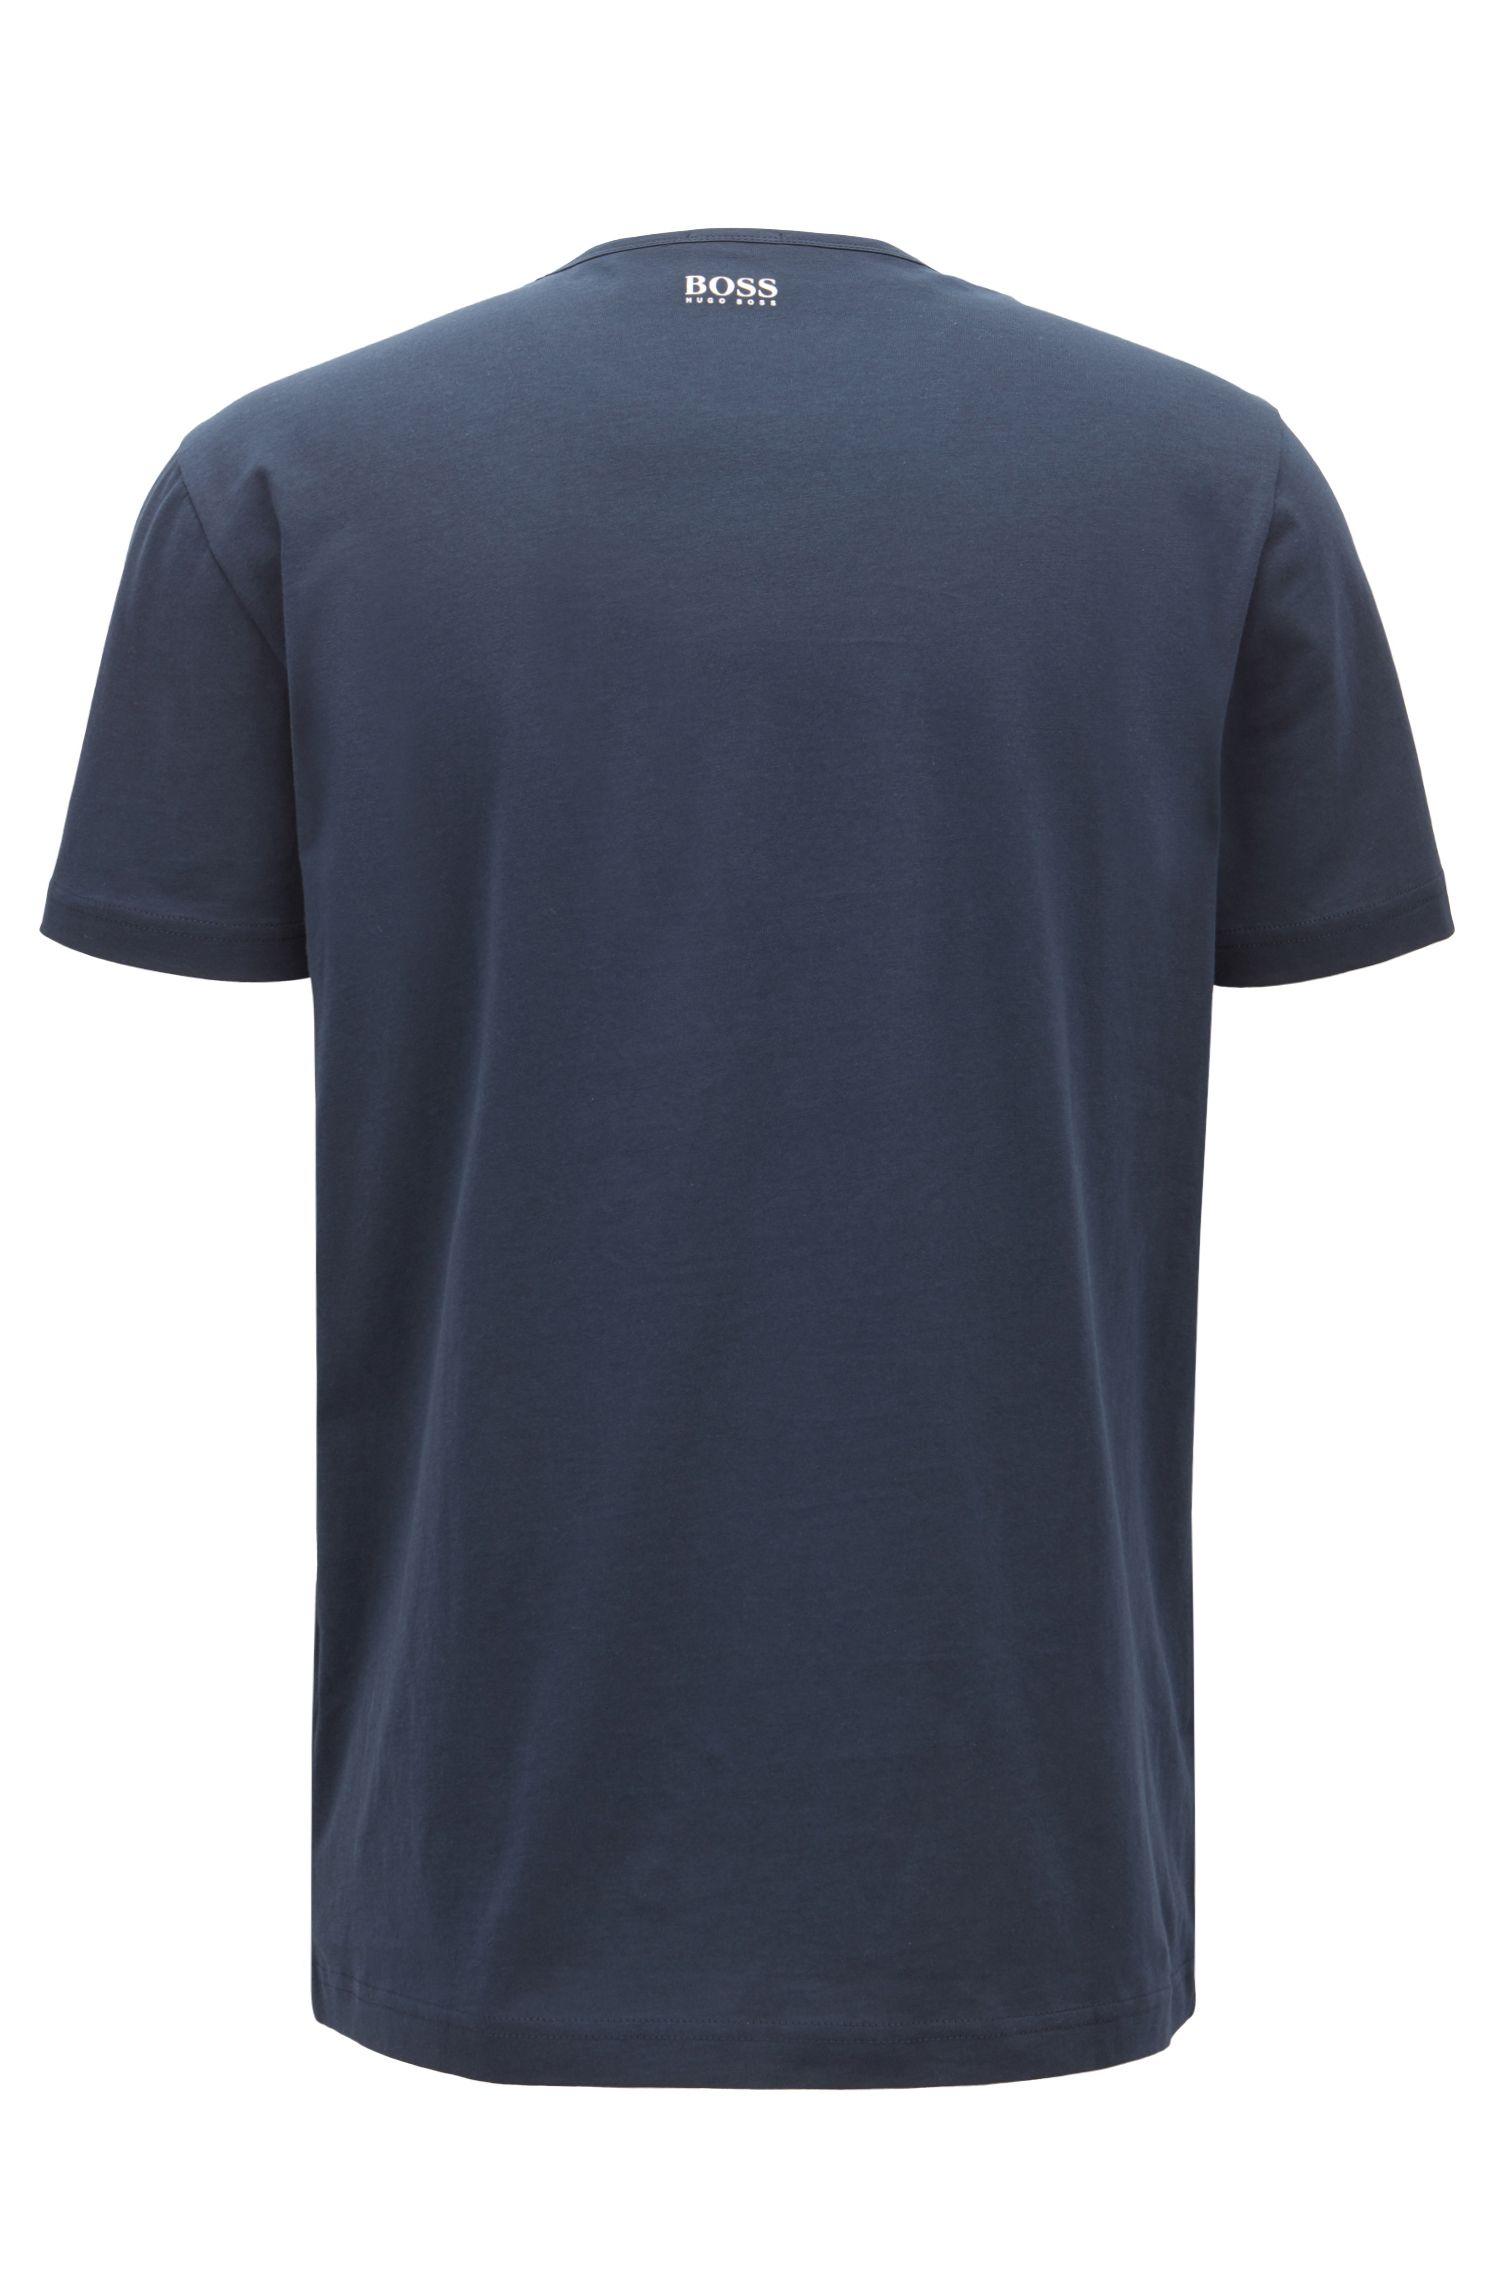 Short-sleeved printed T-shirt in single-jersey cotton, Dark Blue